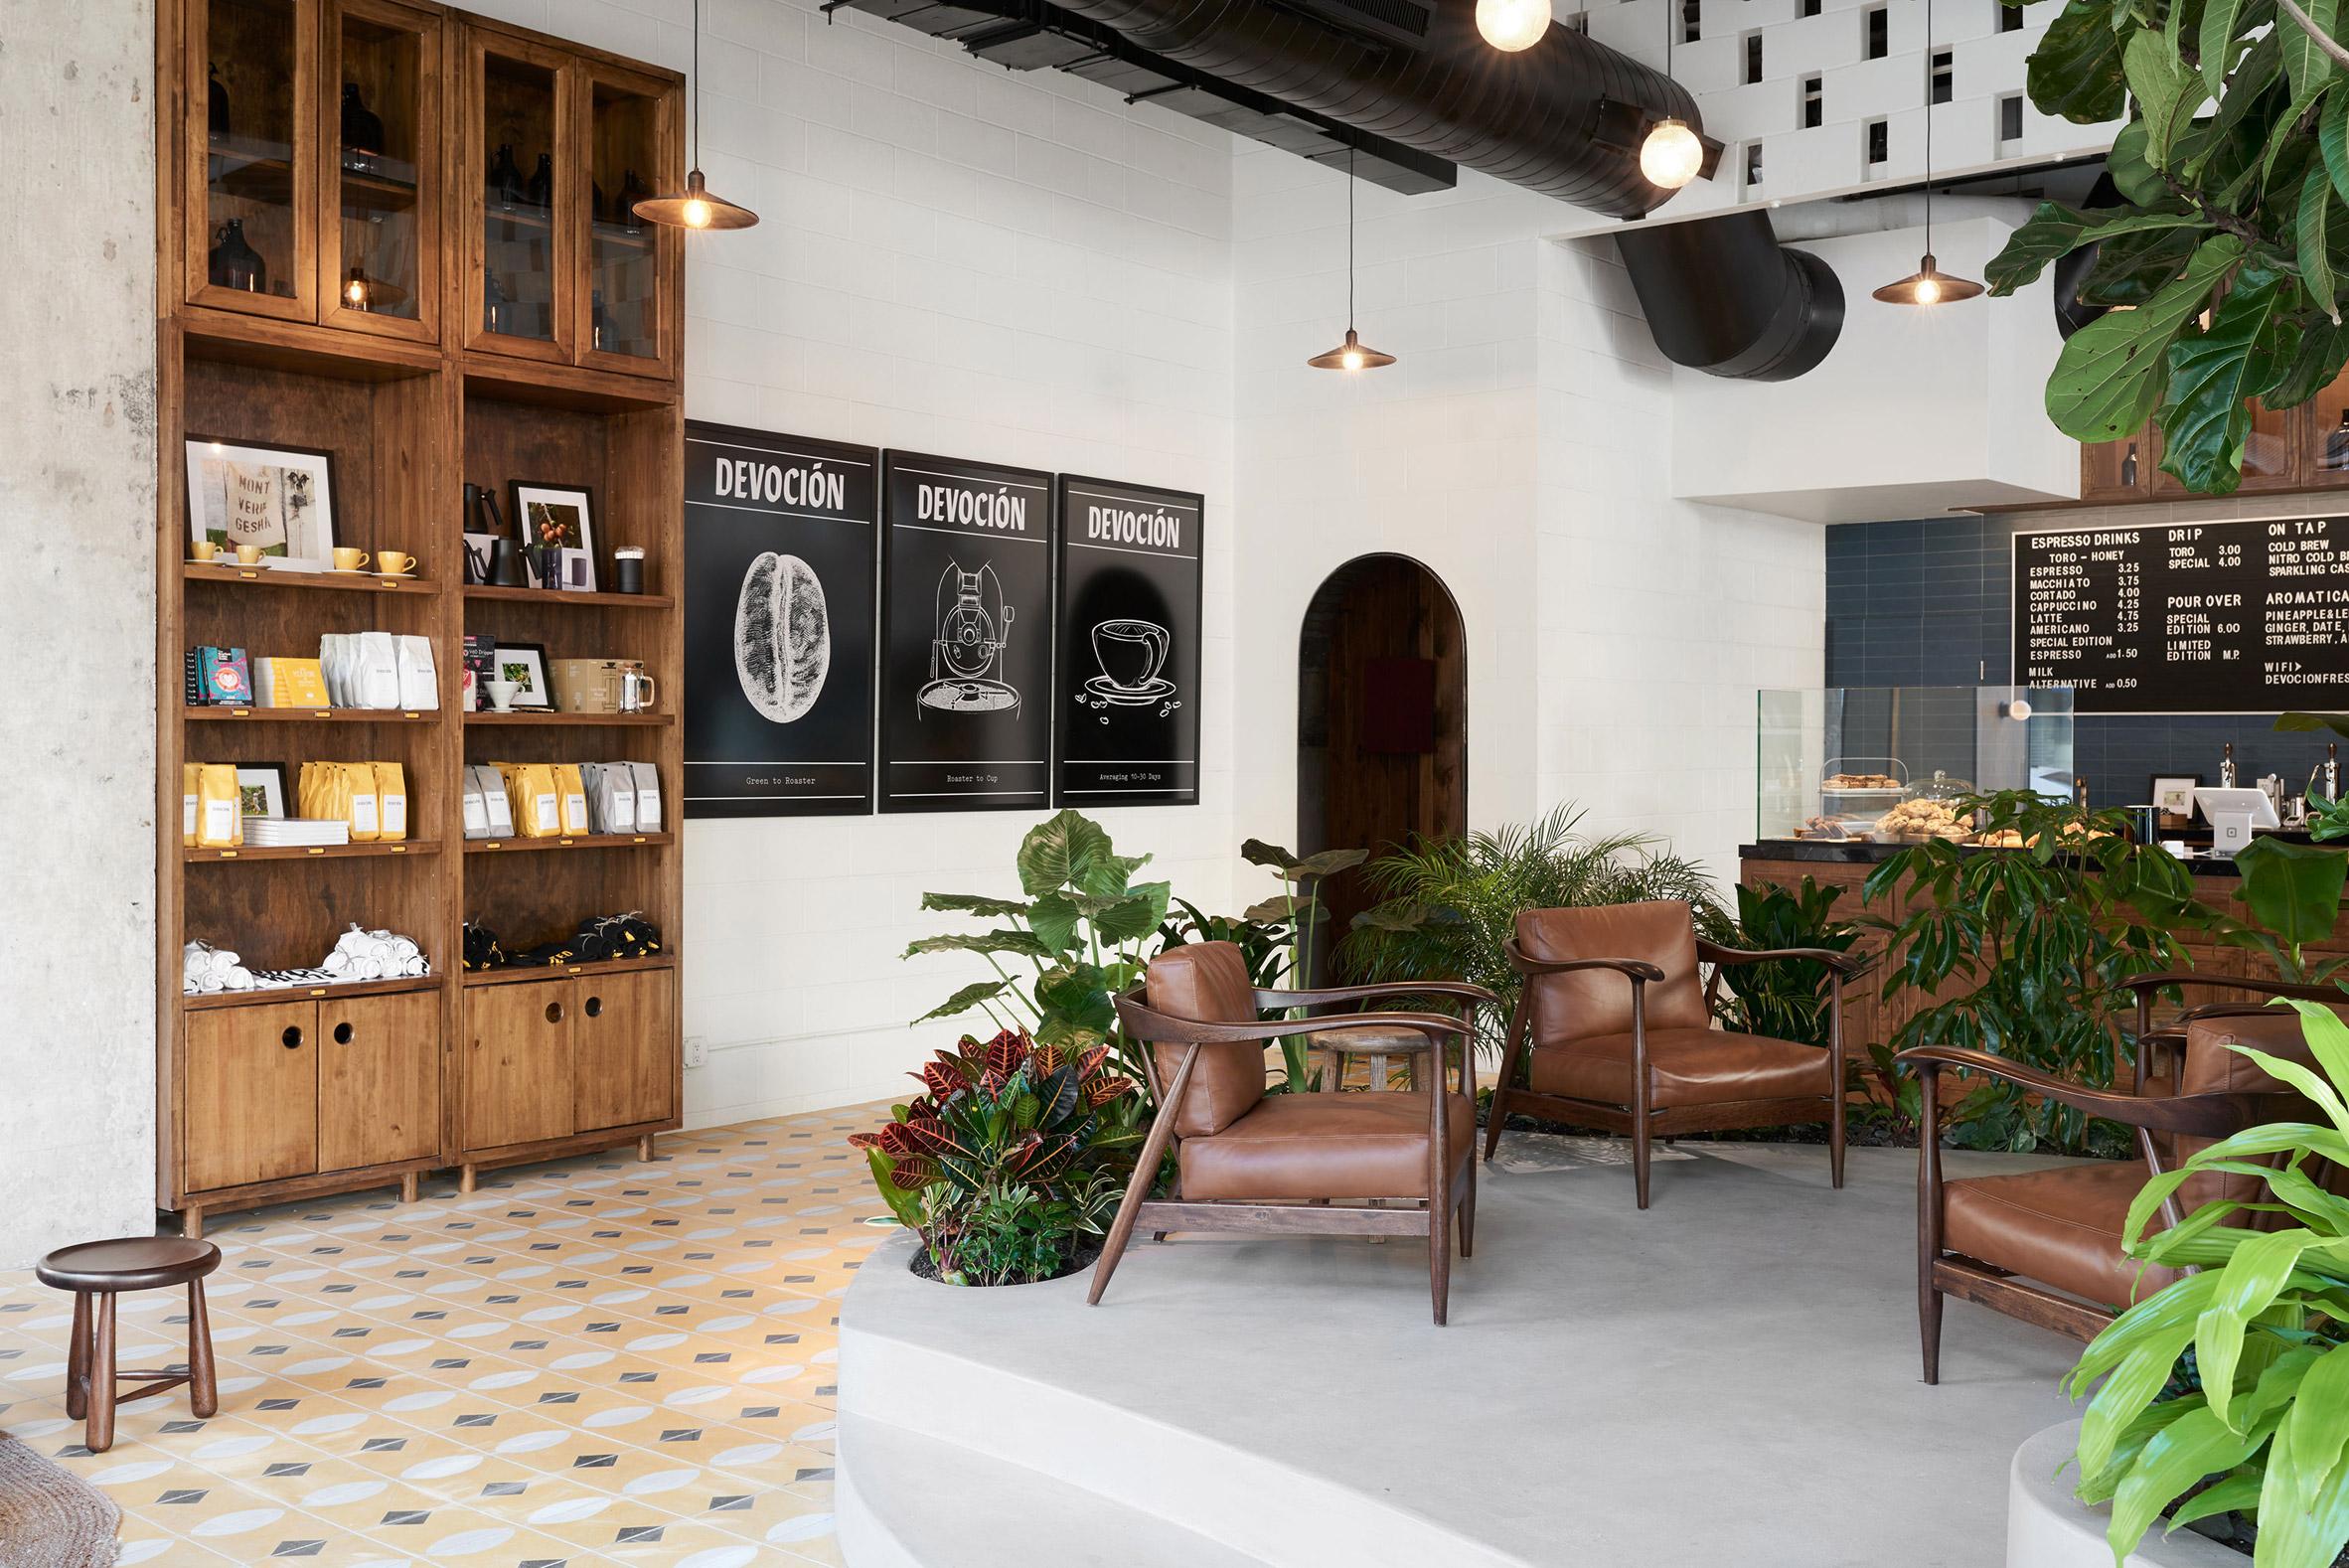 devocion-cafe-lot-interiors-brooklyn-new-york-city-usa_dezeen_2364_col_9.jpg